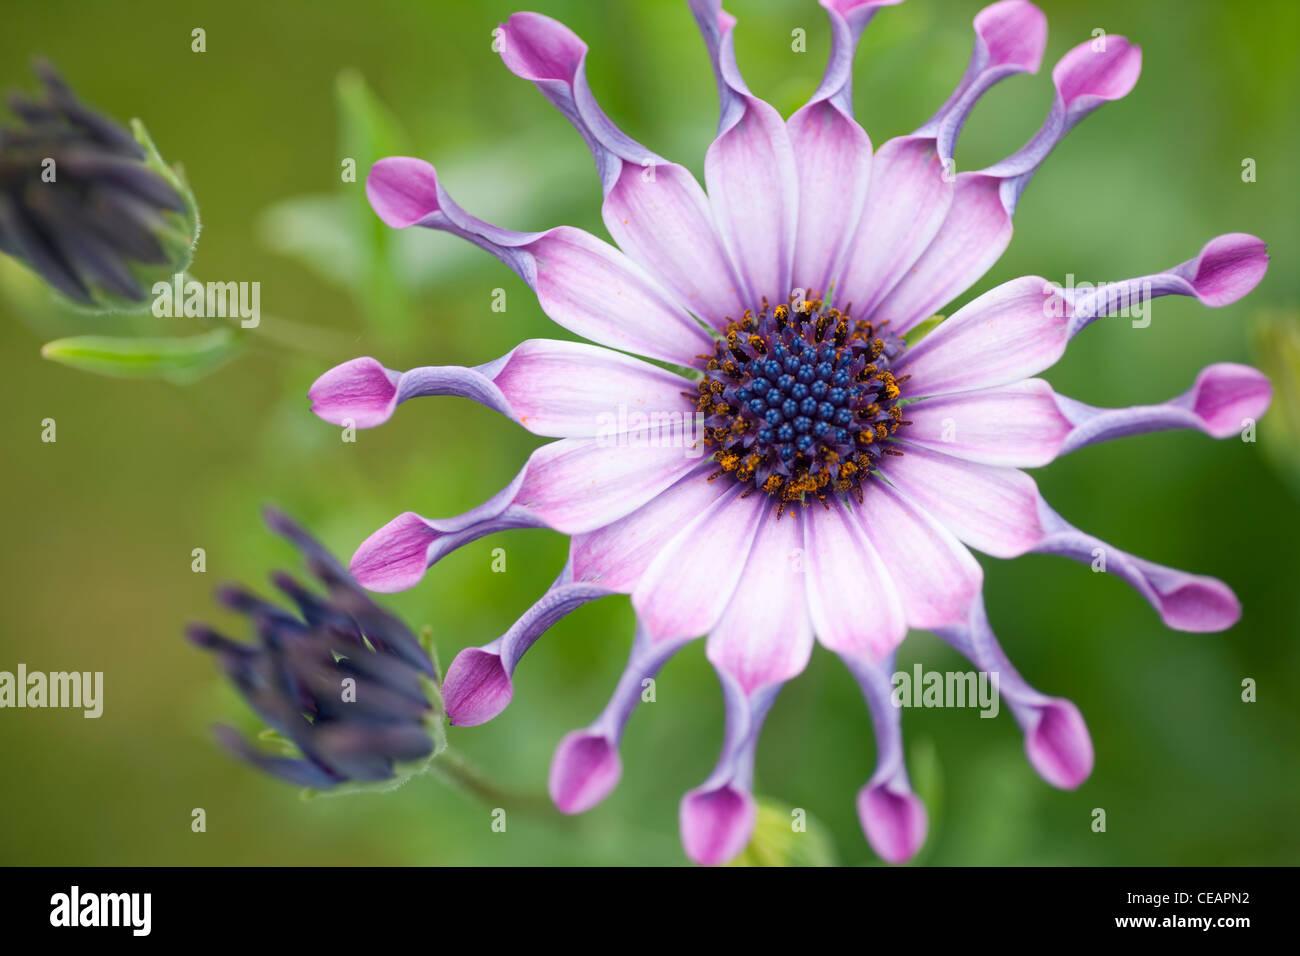 Garden Flowers Uk Serenity Osteospermum Pink P Or African Daisy Or